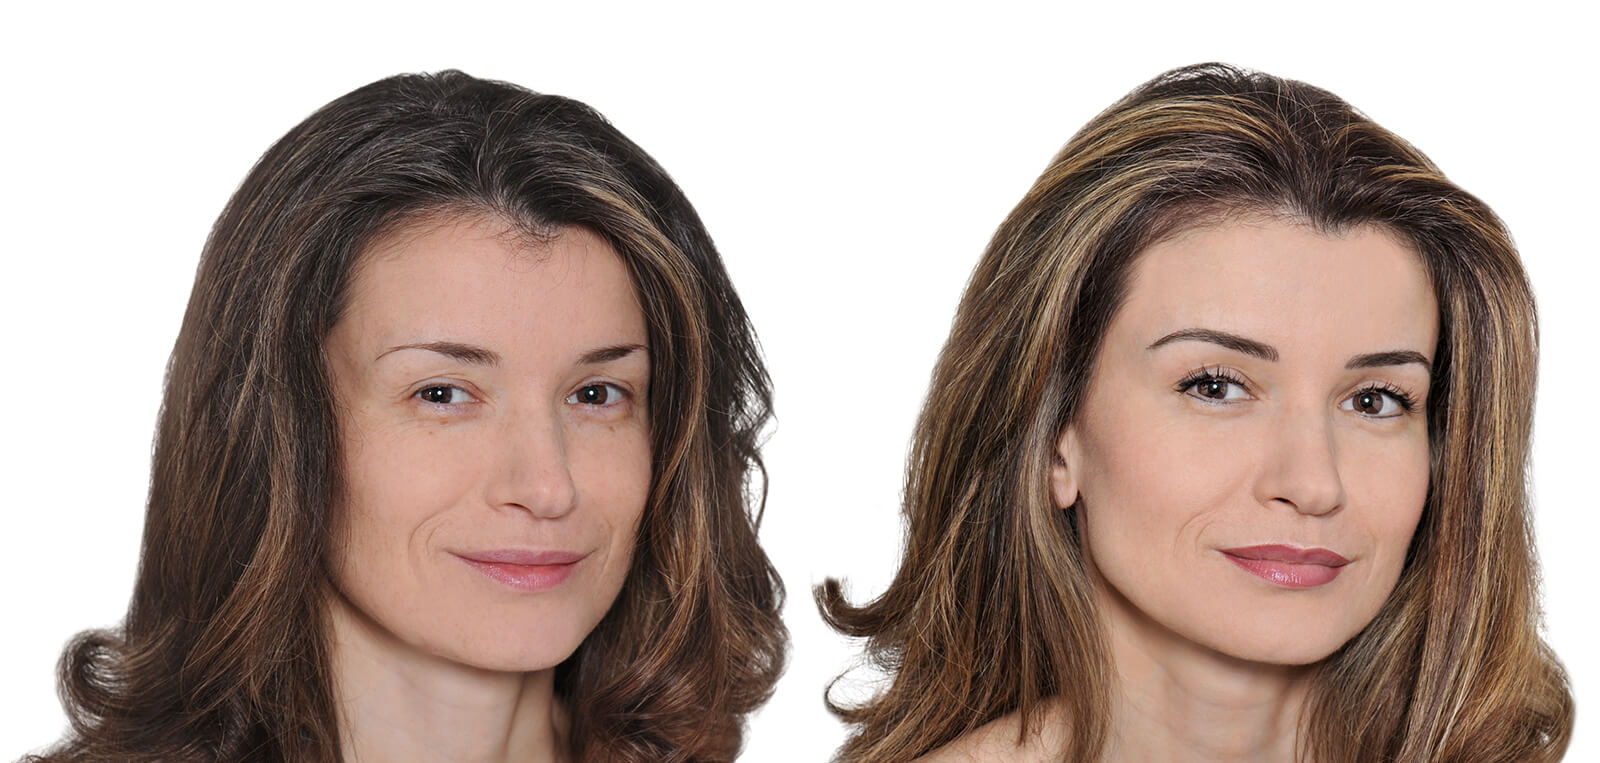 Permanent Make-Up vorher/nachher komplett Damen 01 | Der Jungbrunnen Aichach